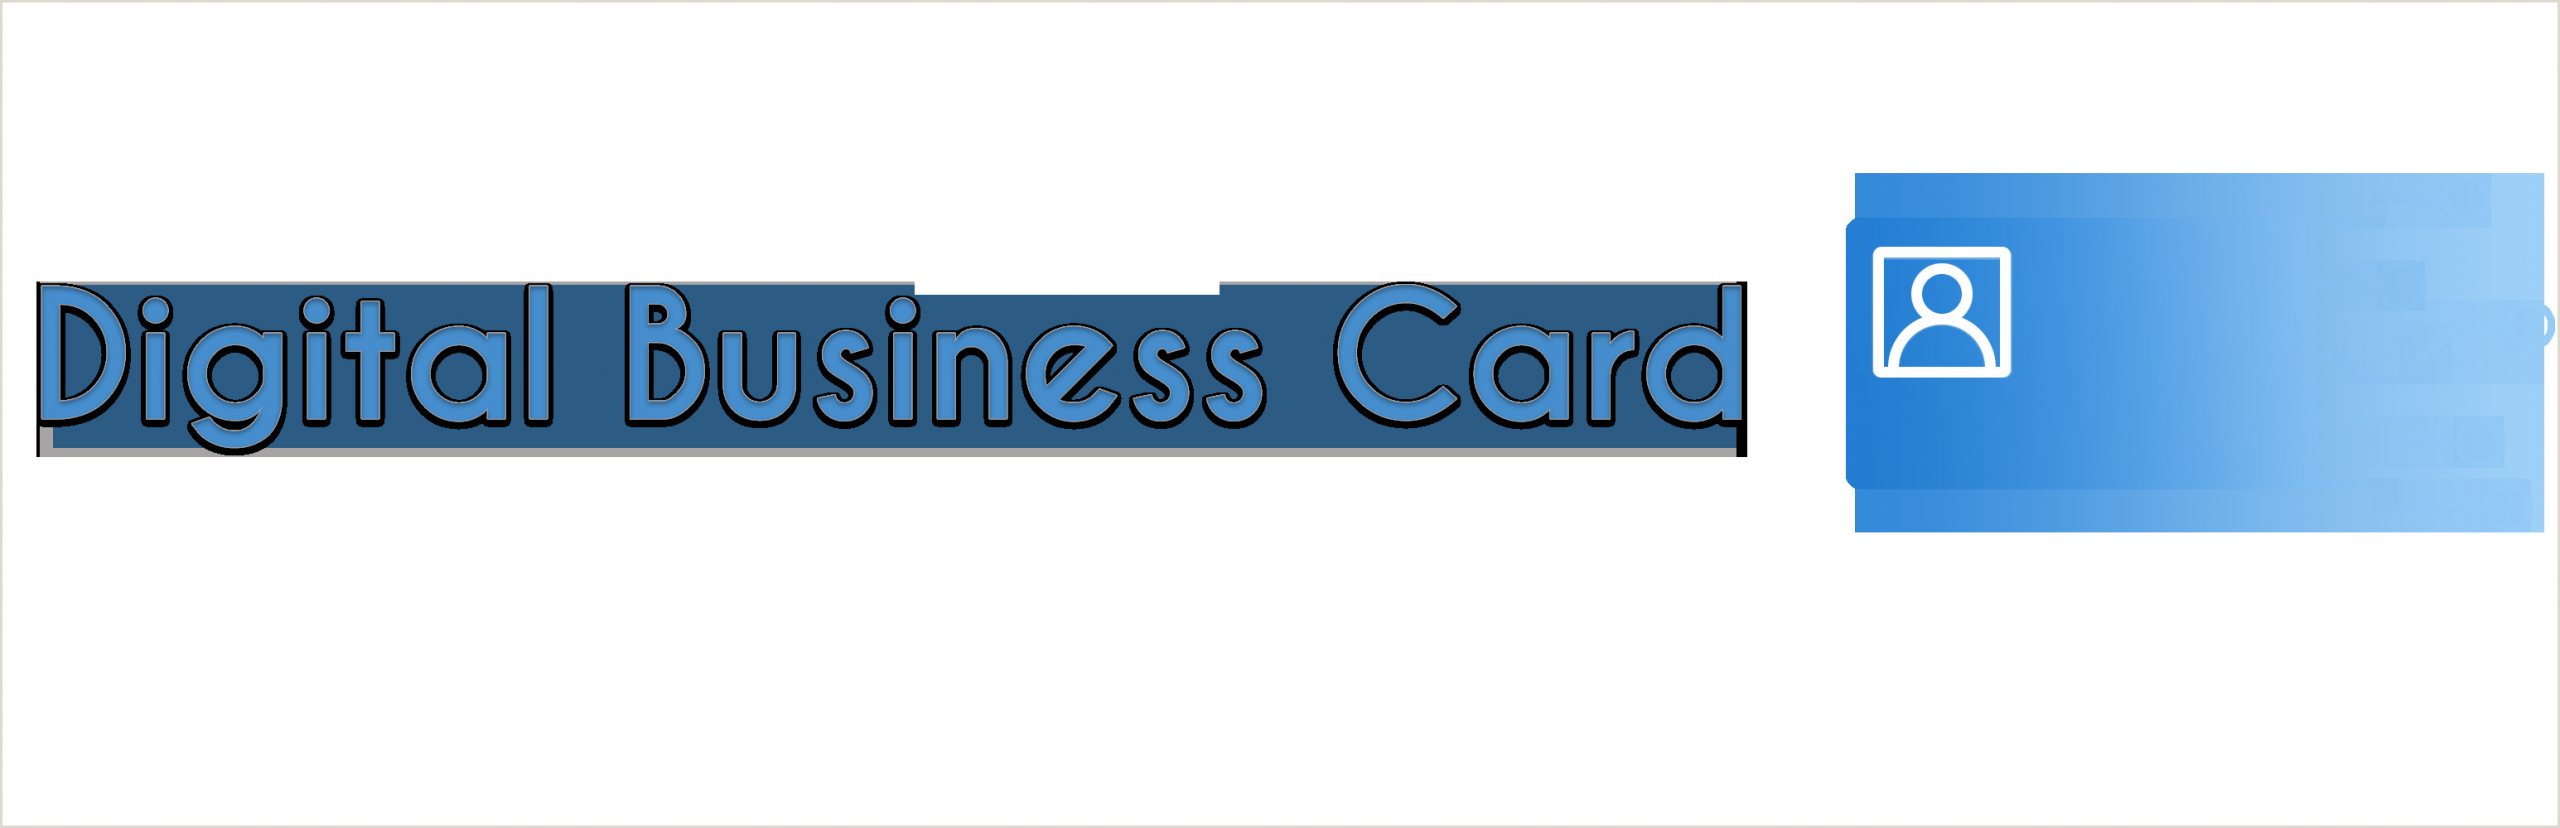 Business Cards Website Best Digital Business Card App